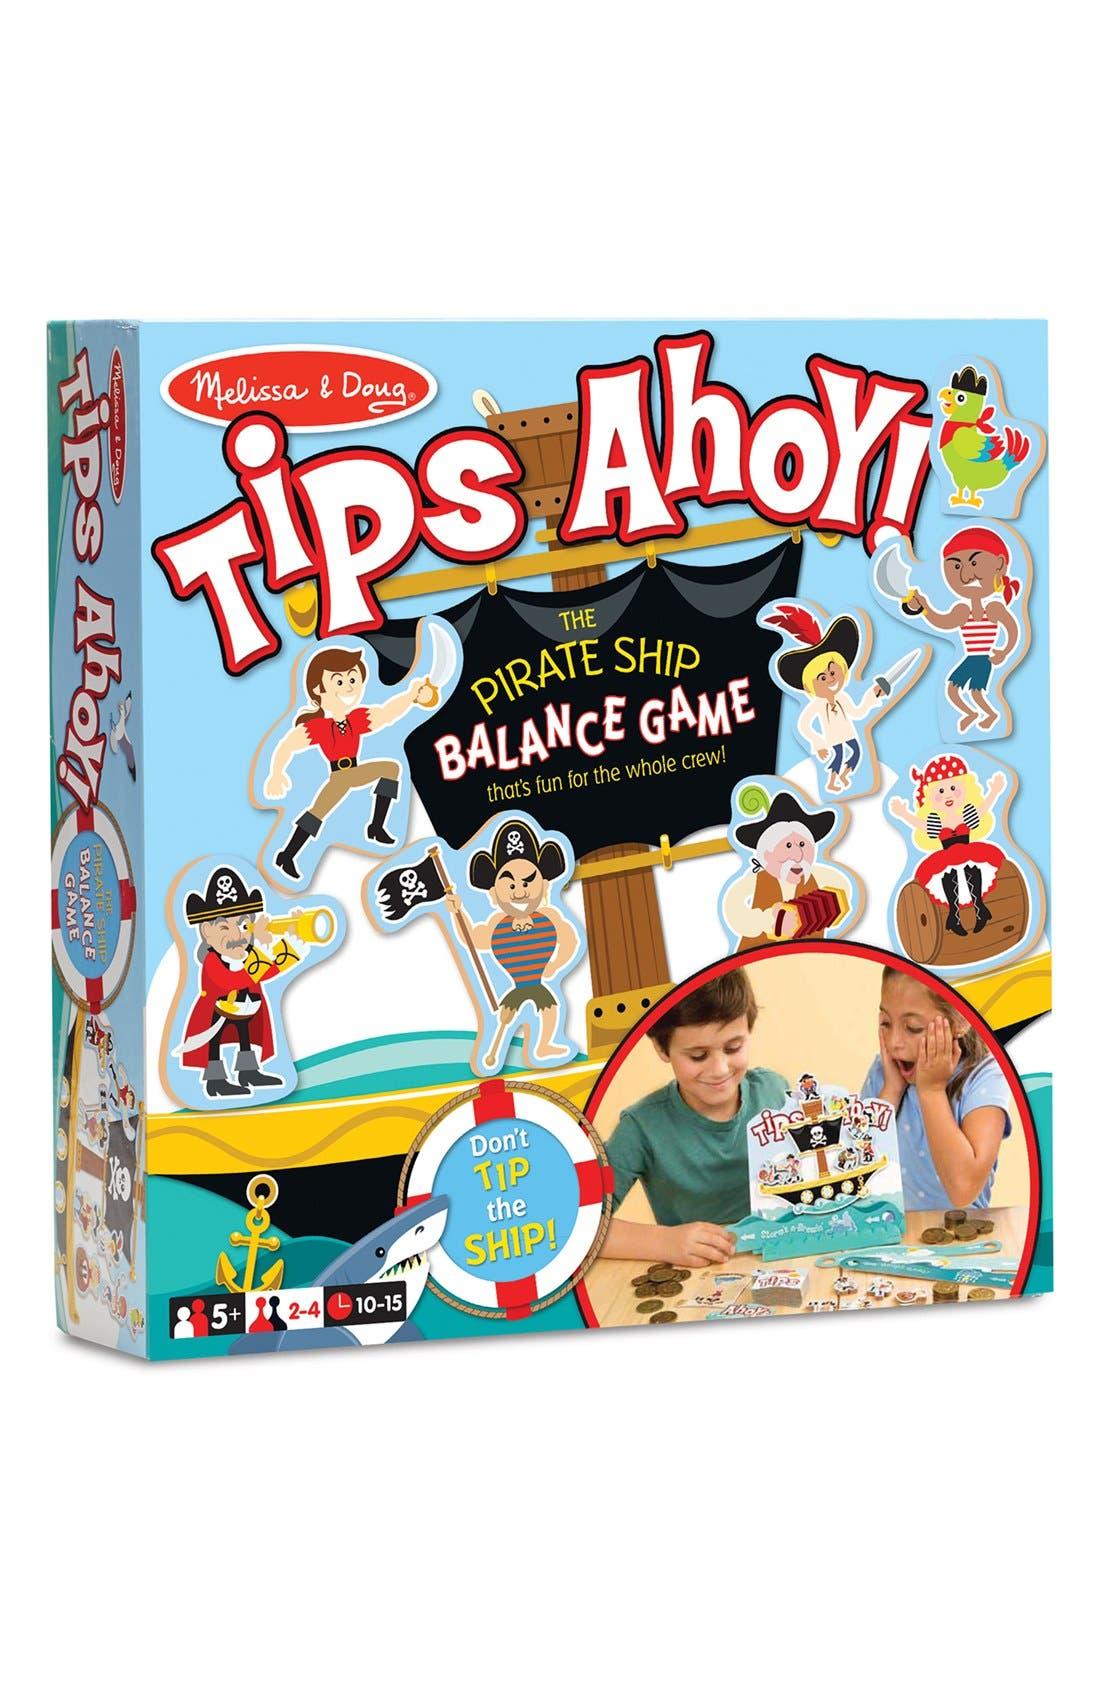 Melissa & Doug 'Tips Ahoy' Game